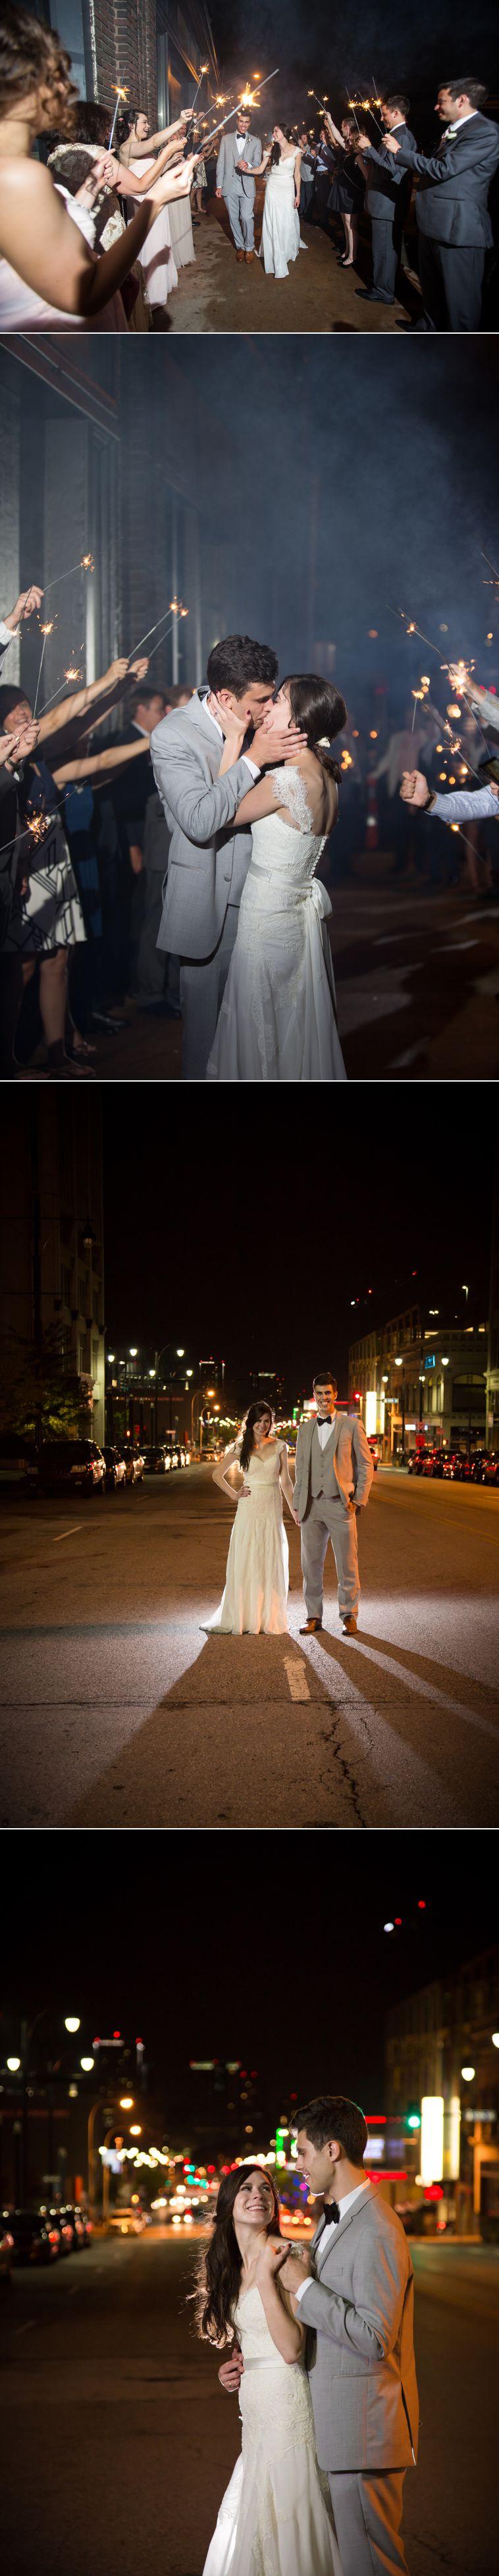 18_Kansas City Wedding Photography